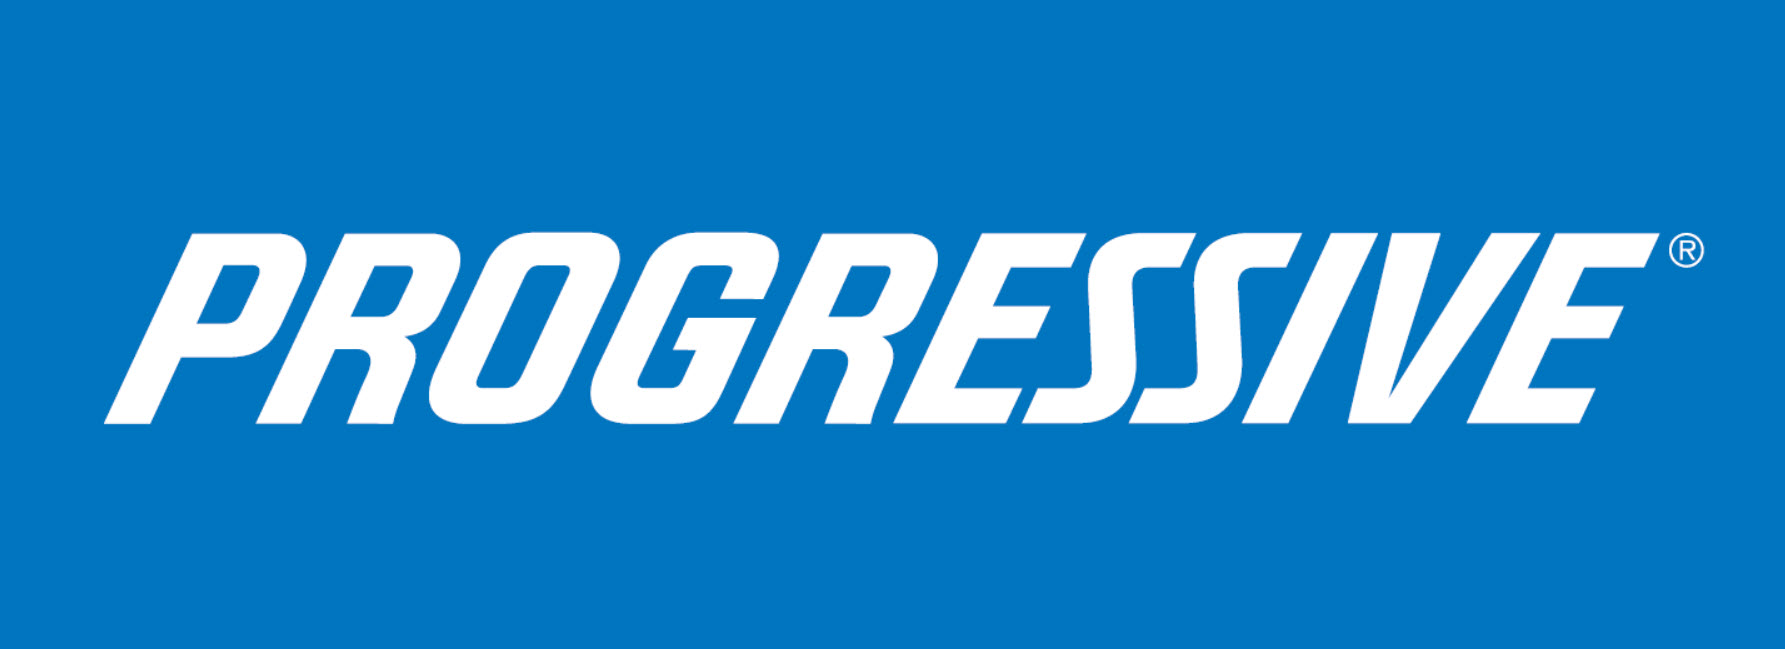 https://watson-insurance.com/wp-content/uploads/2019/11/progressive.png